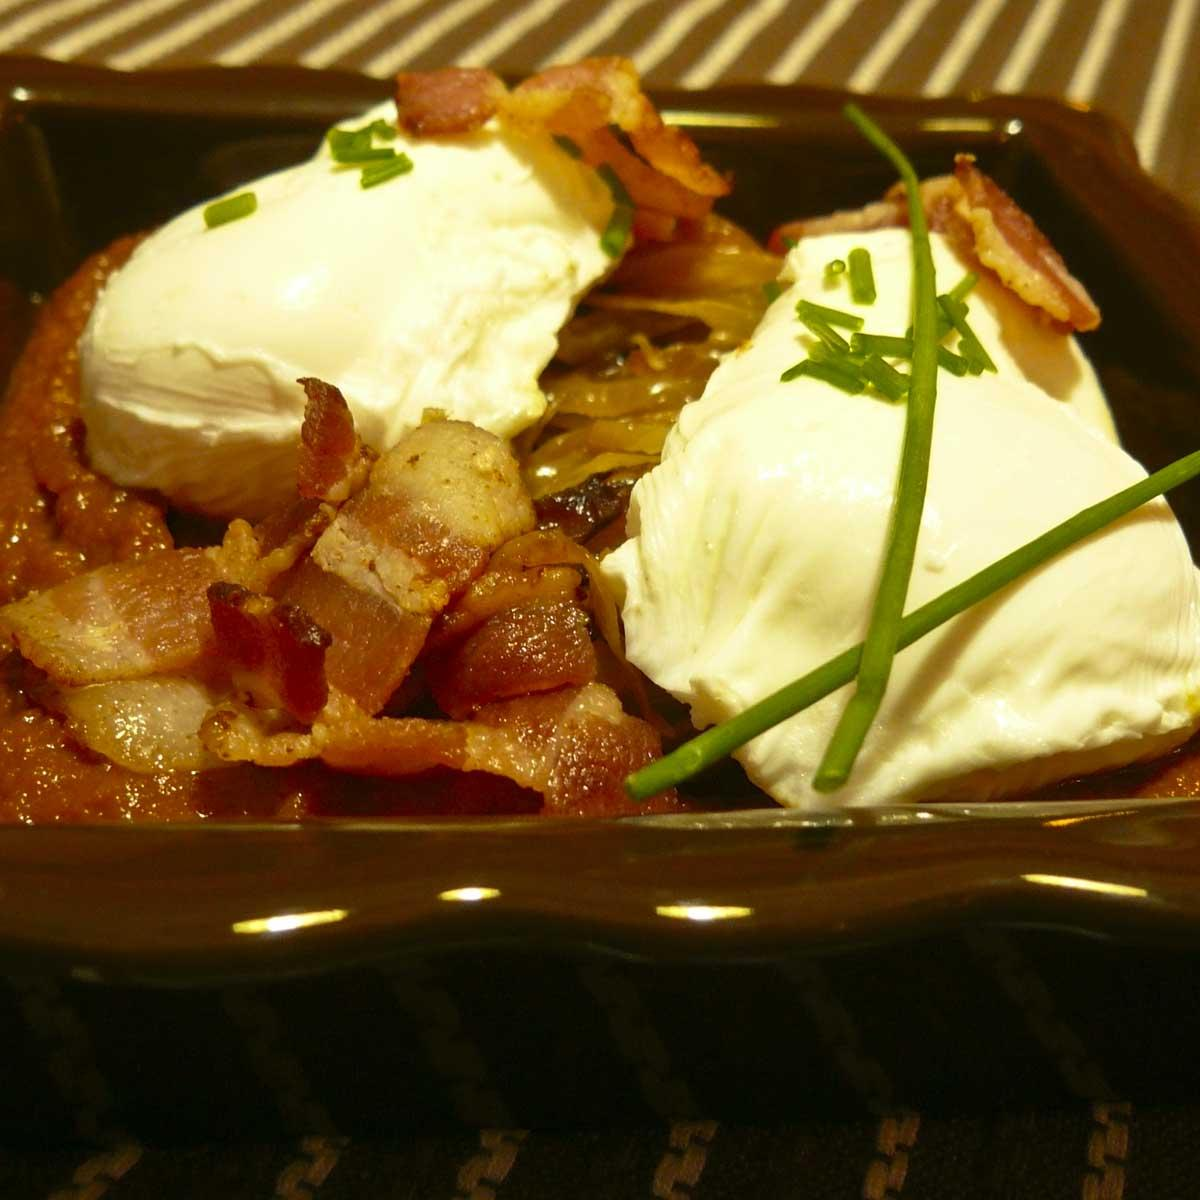 Recette les ufs en meurette de bernard loiseau cuisine for Cuisine bernard